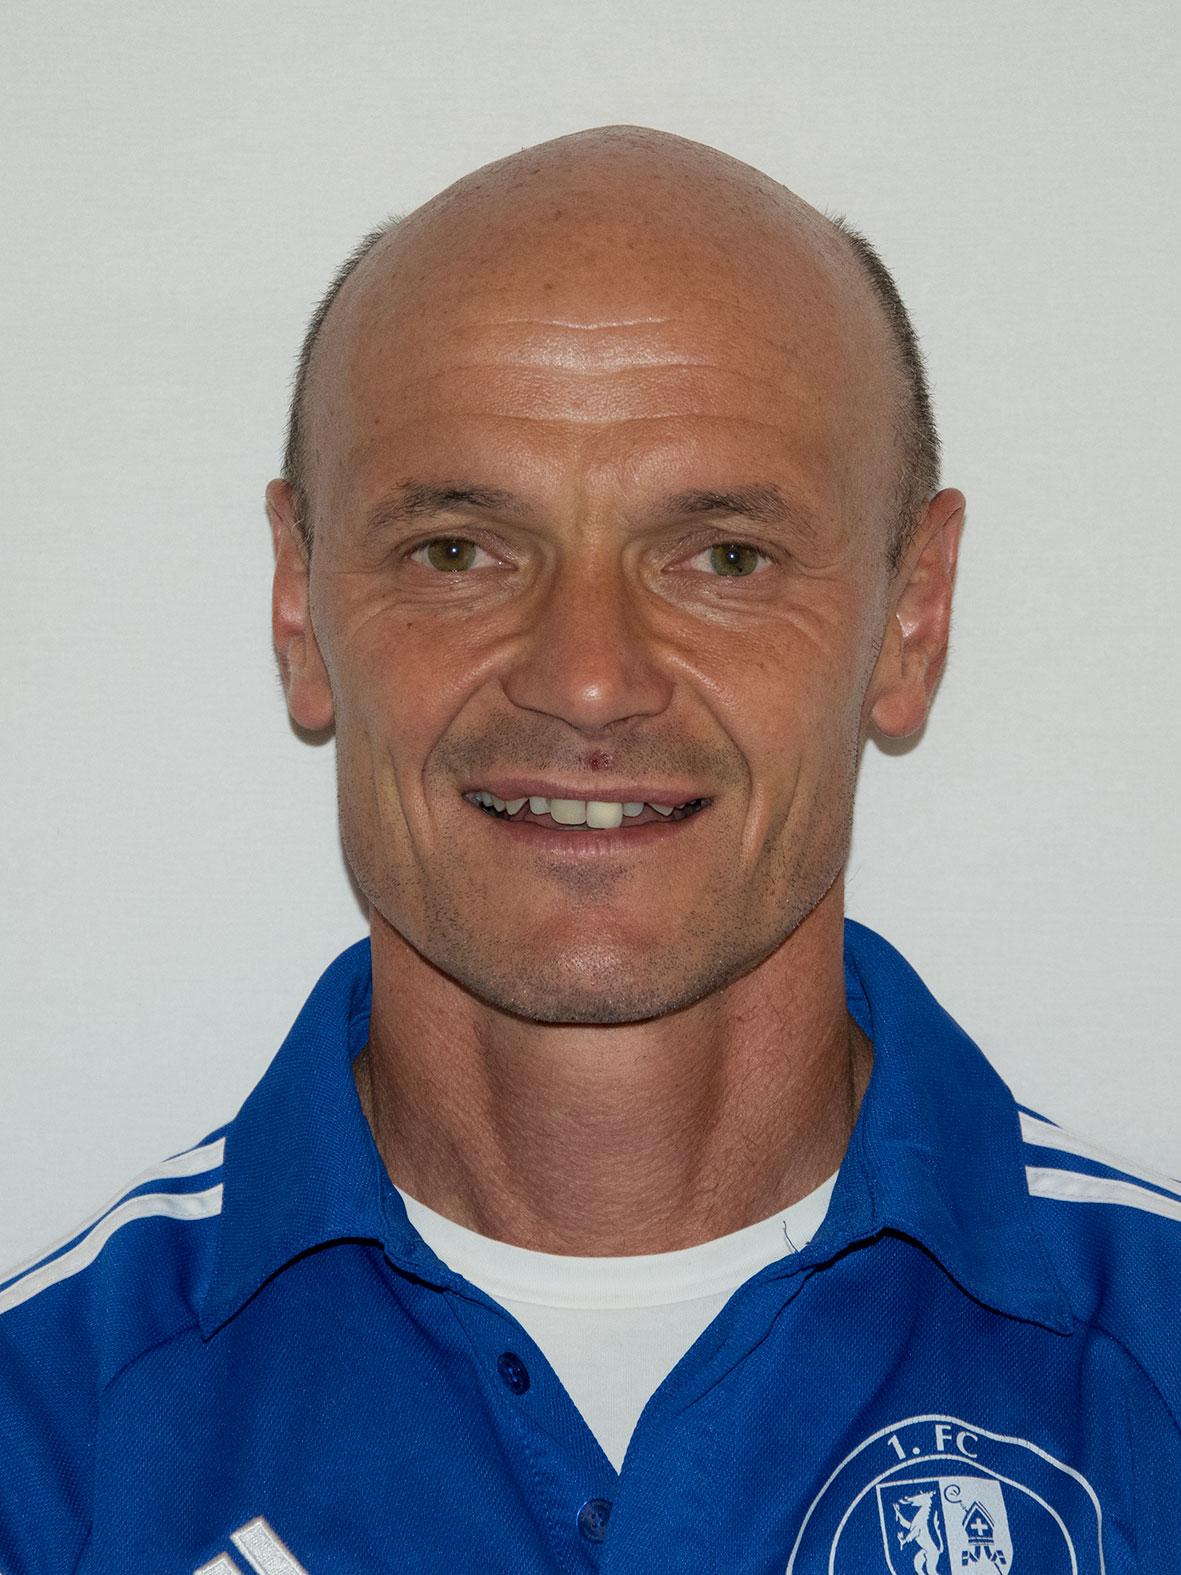 Hansjörg Fedrizzi